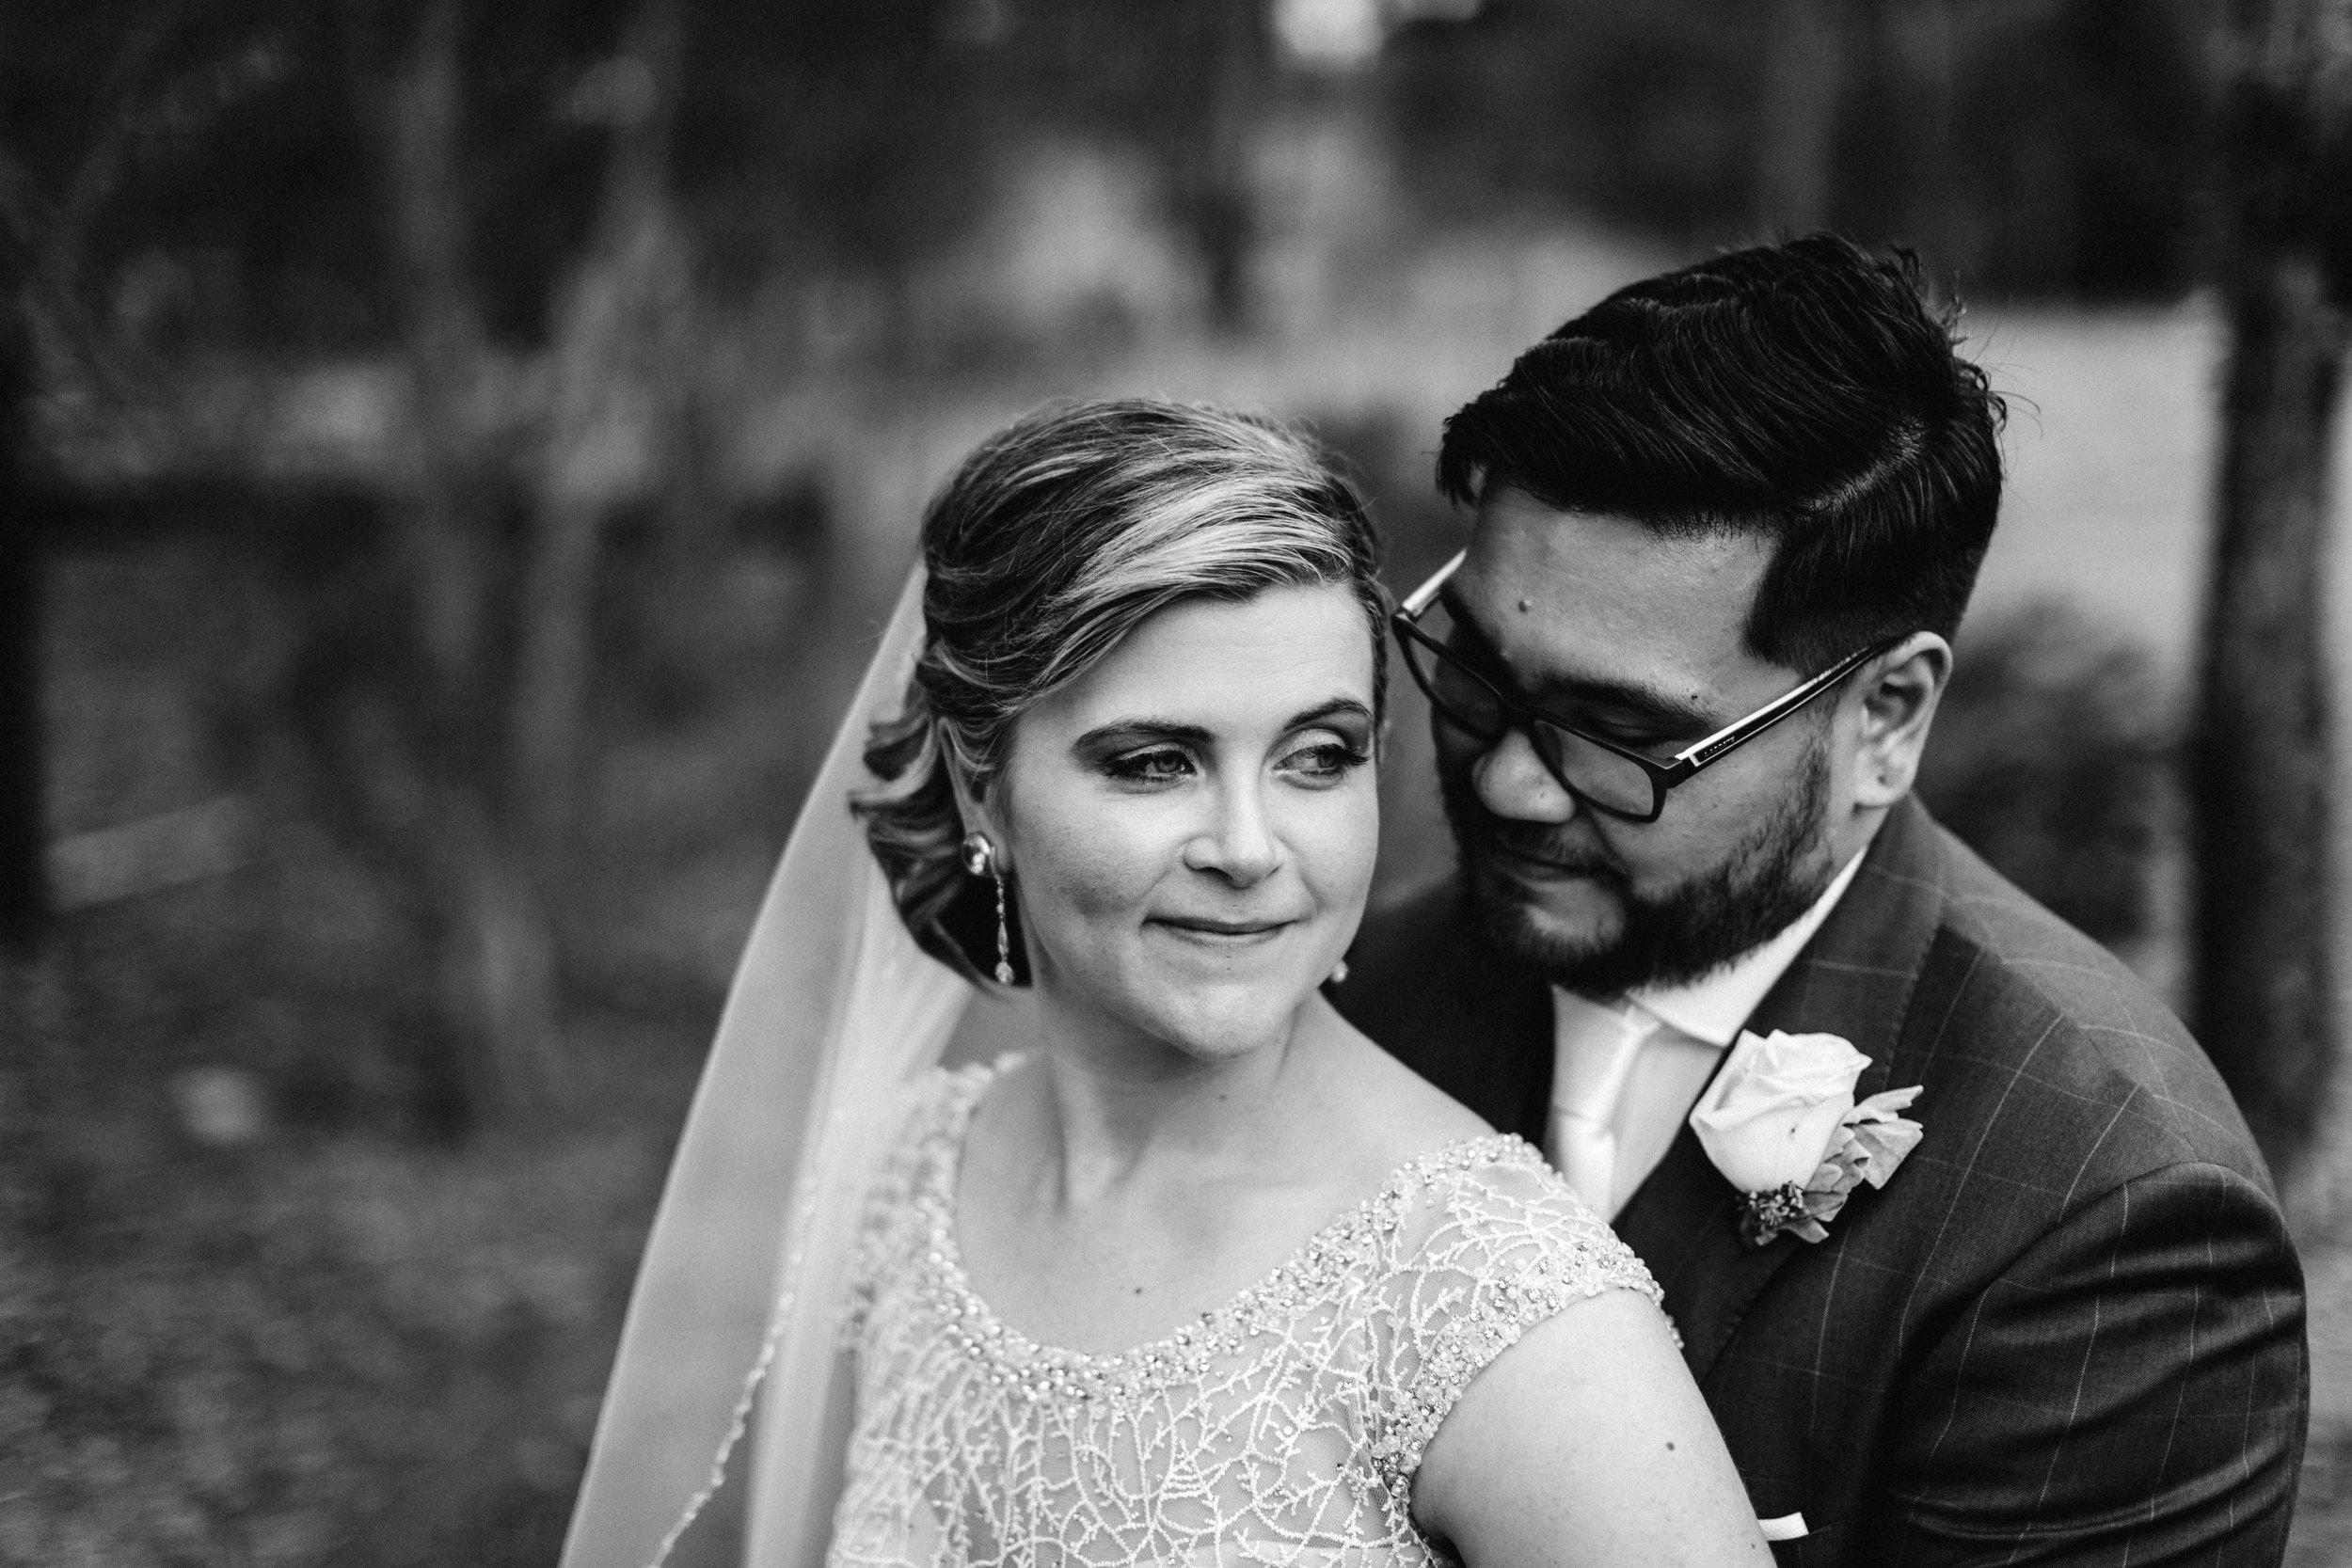 appin-house-wedding-macarthur-www.emilyobrienphotography.net-139.jpg